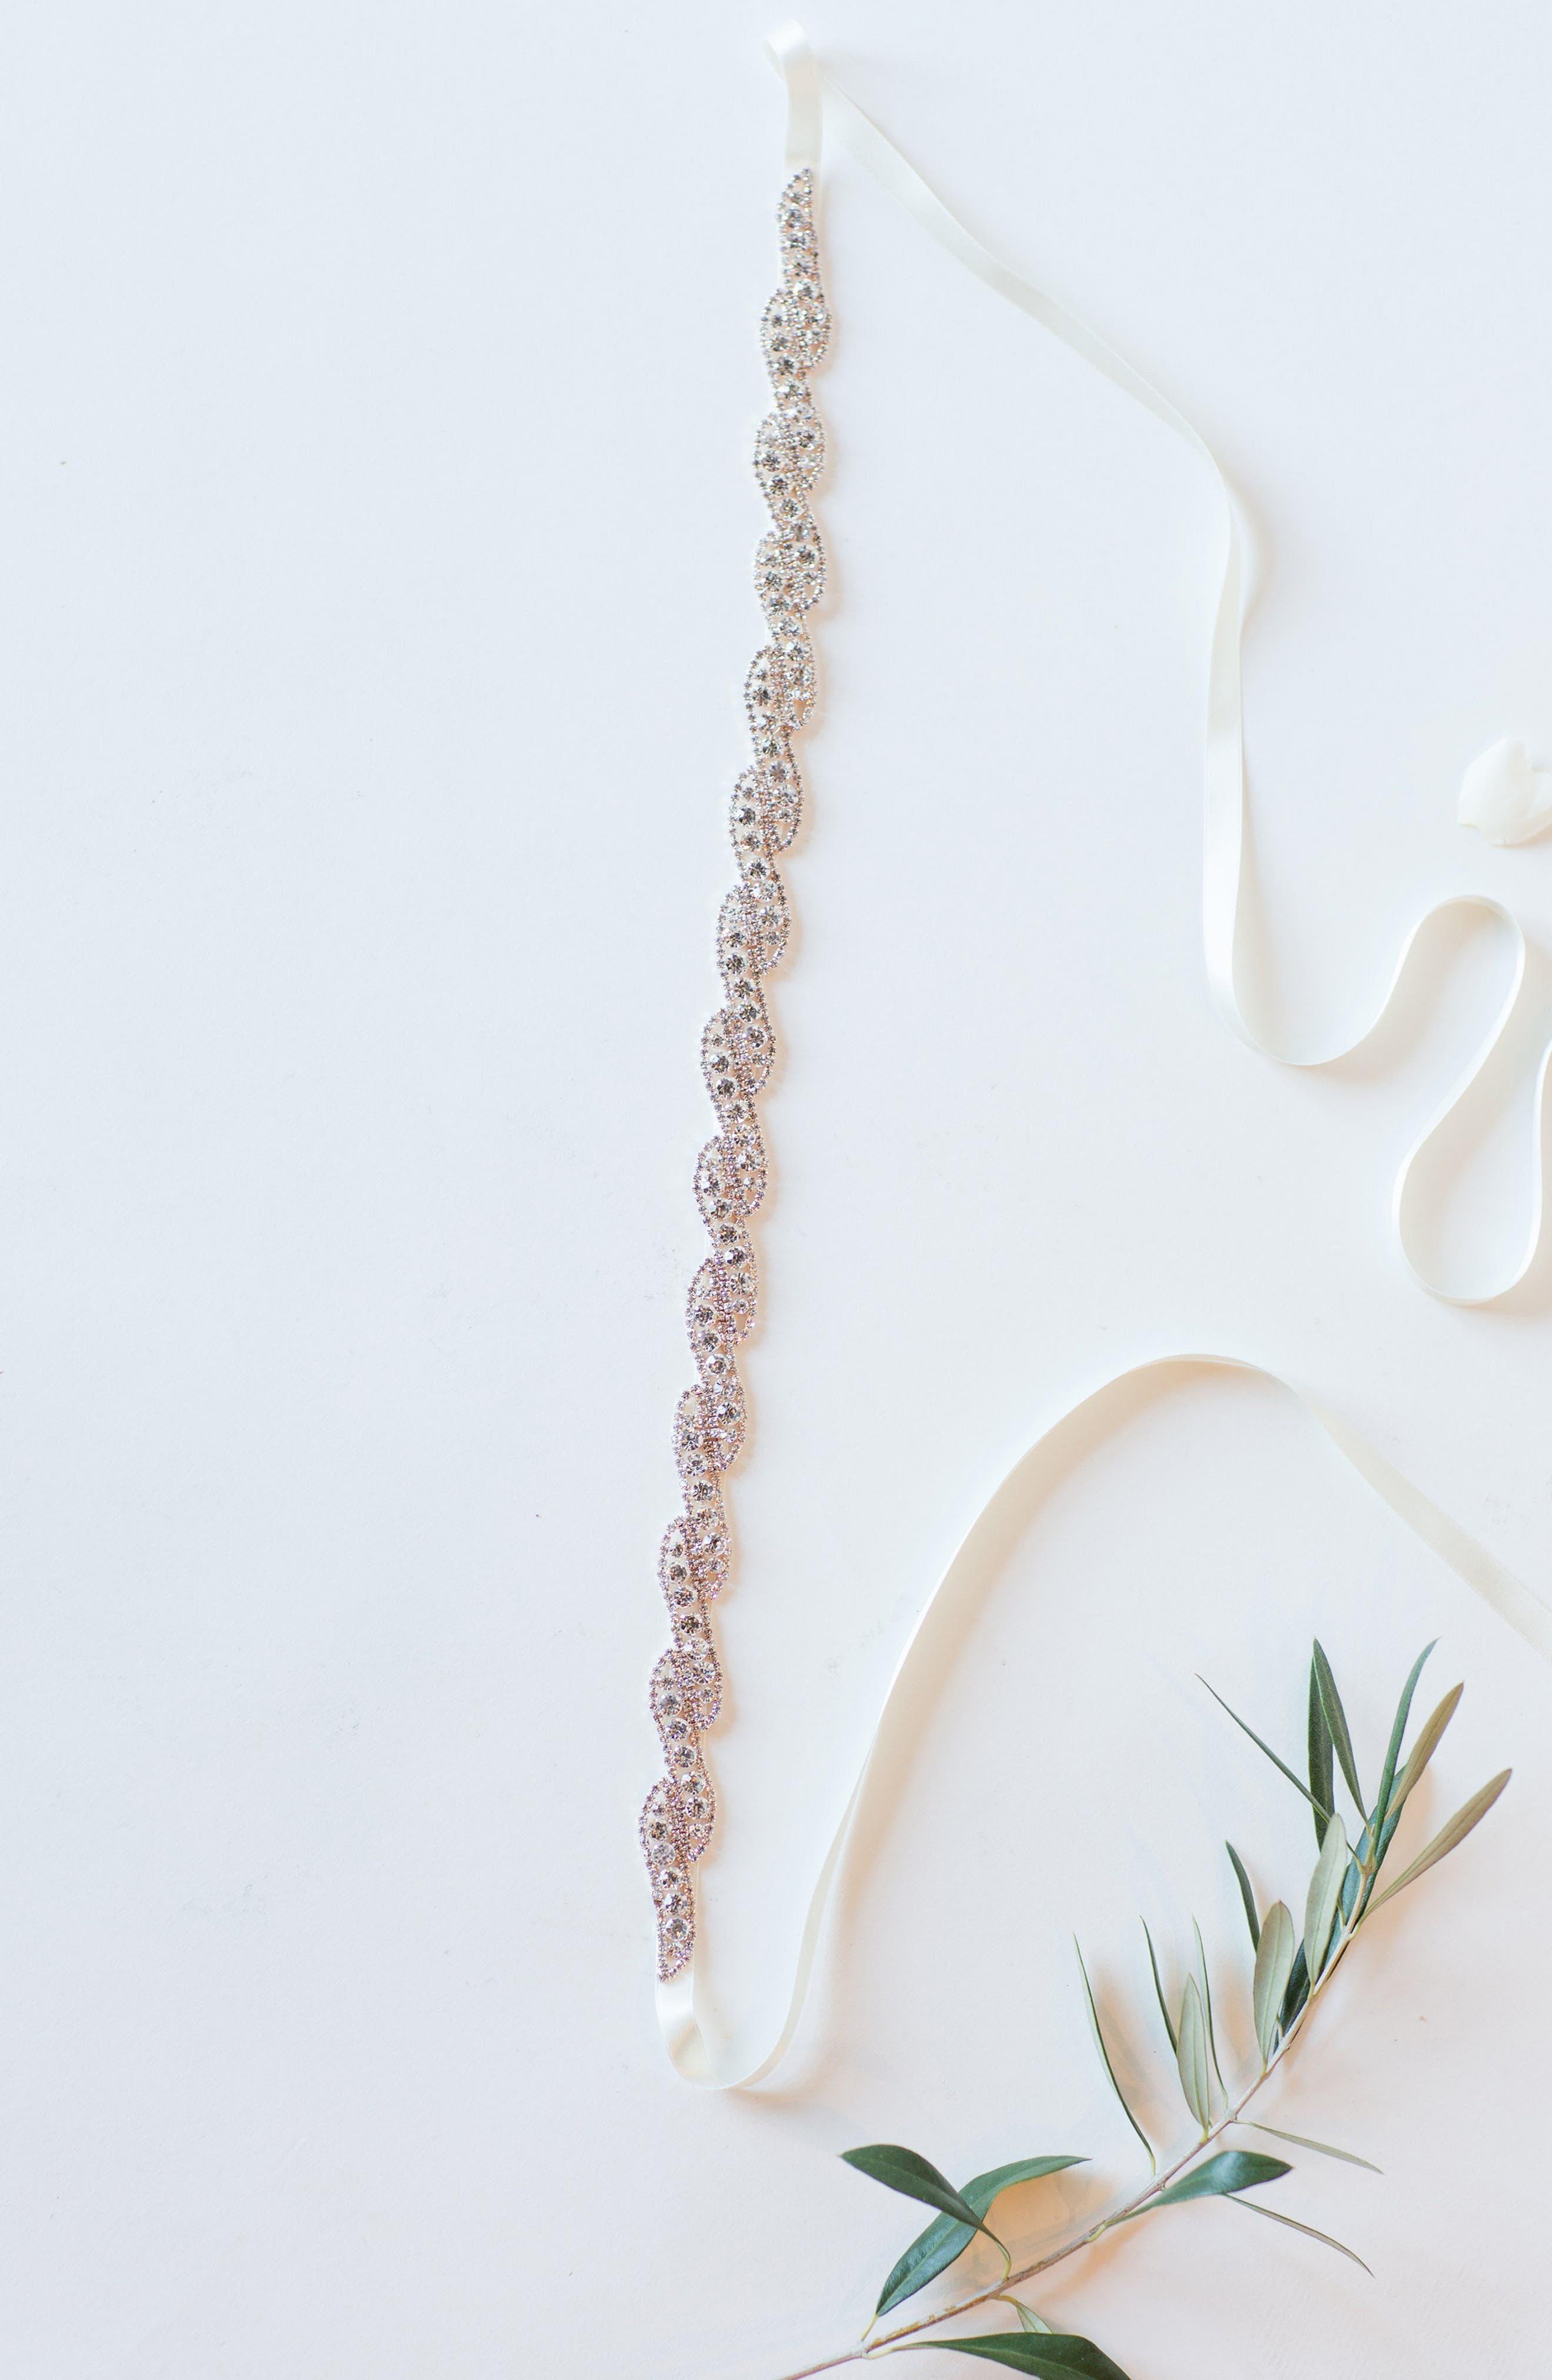 Untamed Petals By Amanda Judge Aliza Crystal Overlay Belt, Size One Size - Rose Gold